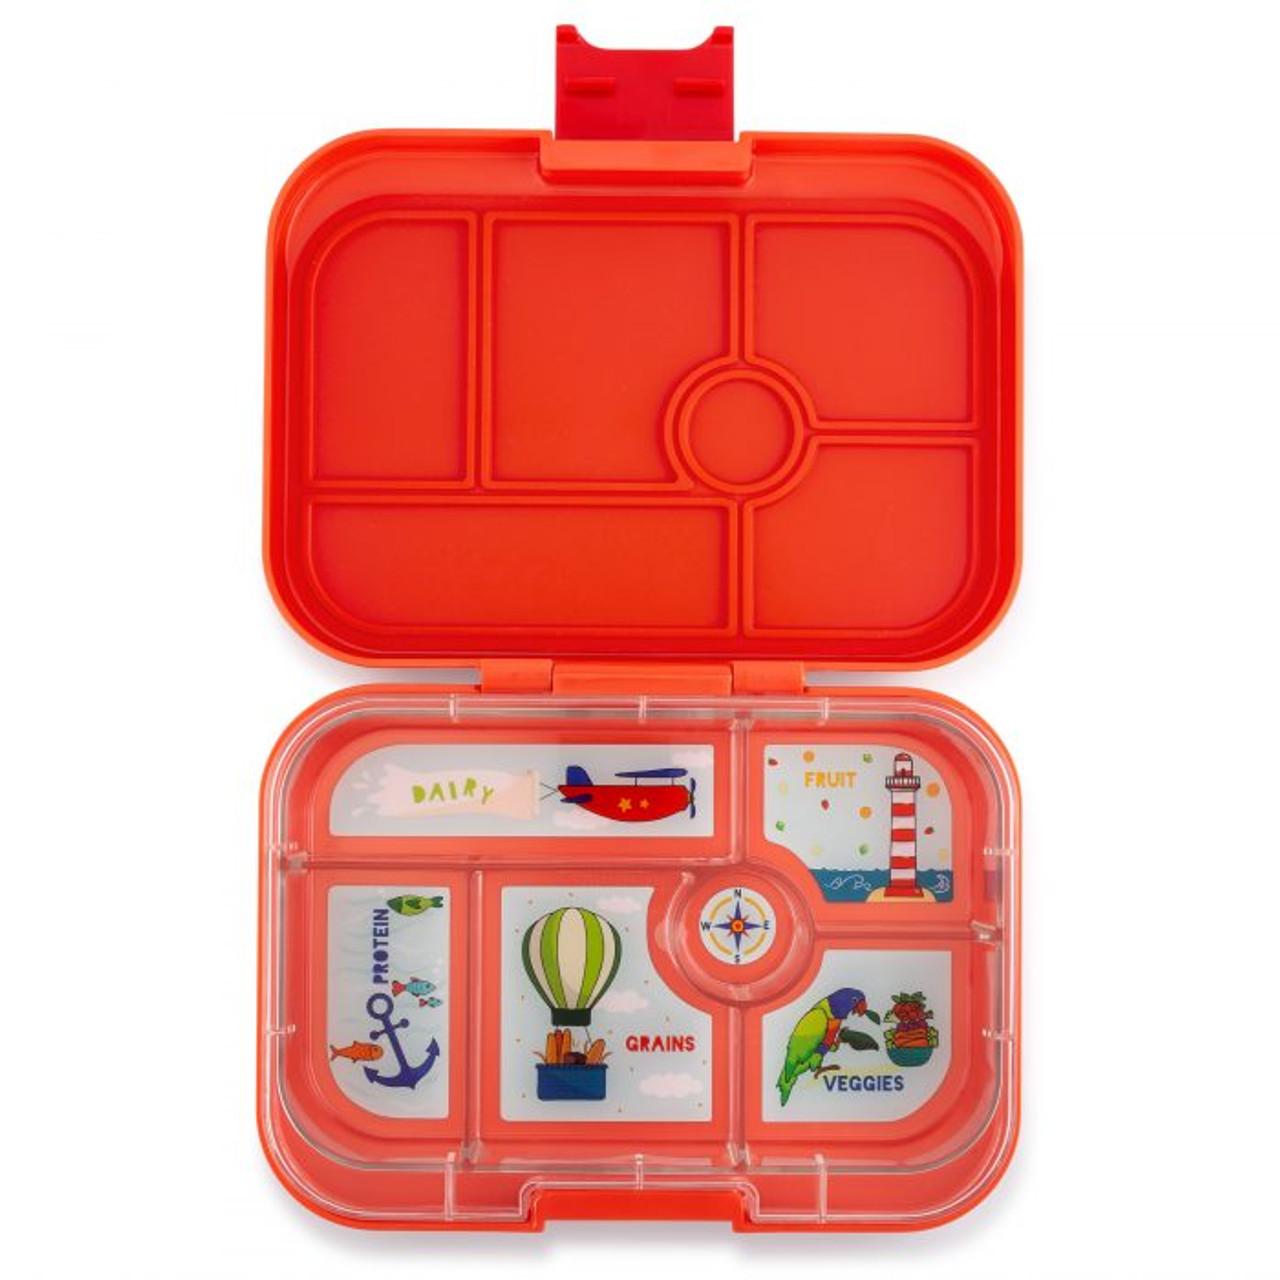 Yumbox Original 6 Compartment Bento Lunchbox